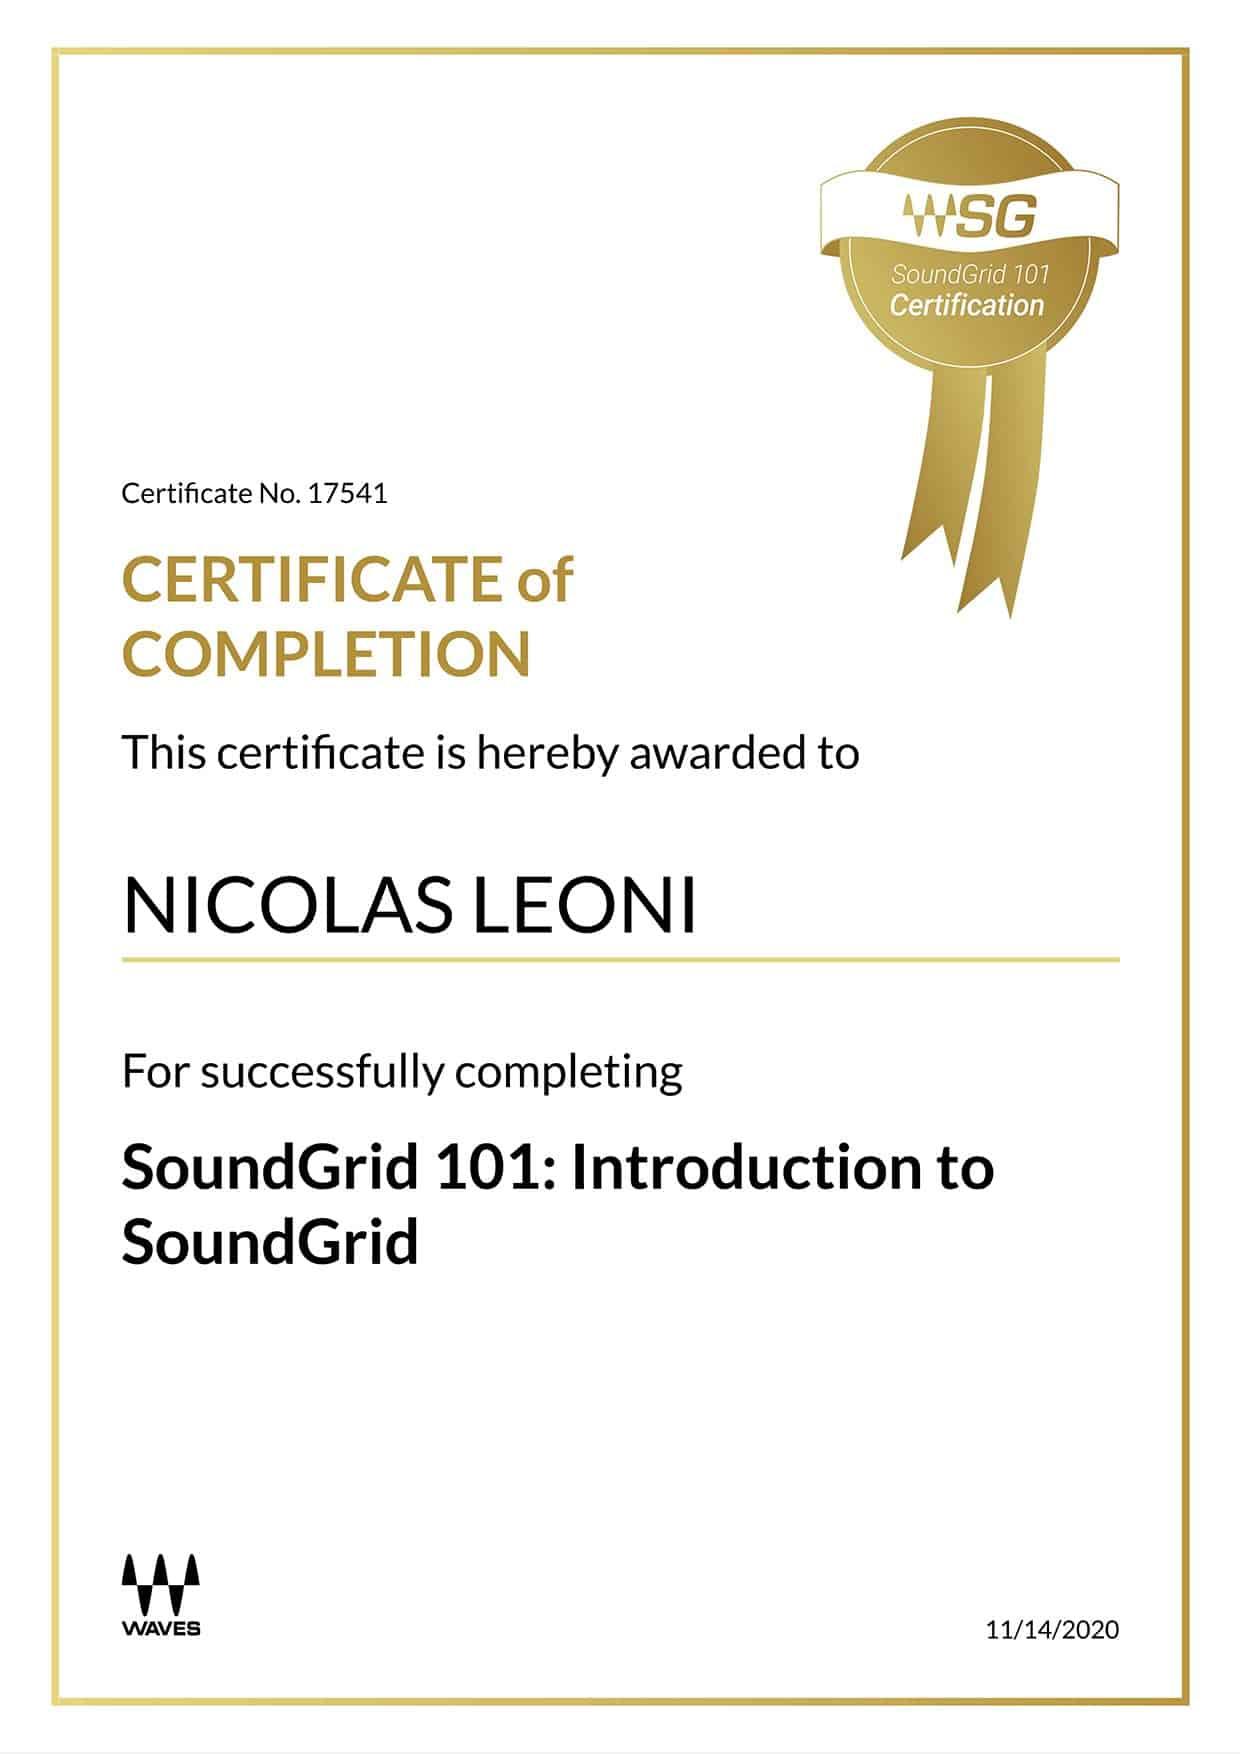 Certificato Waves SoundGrid 101